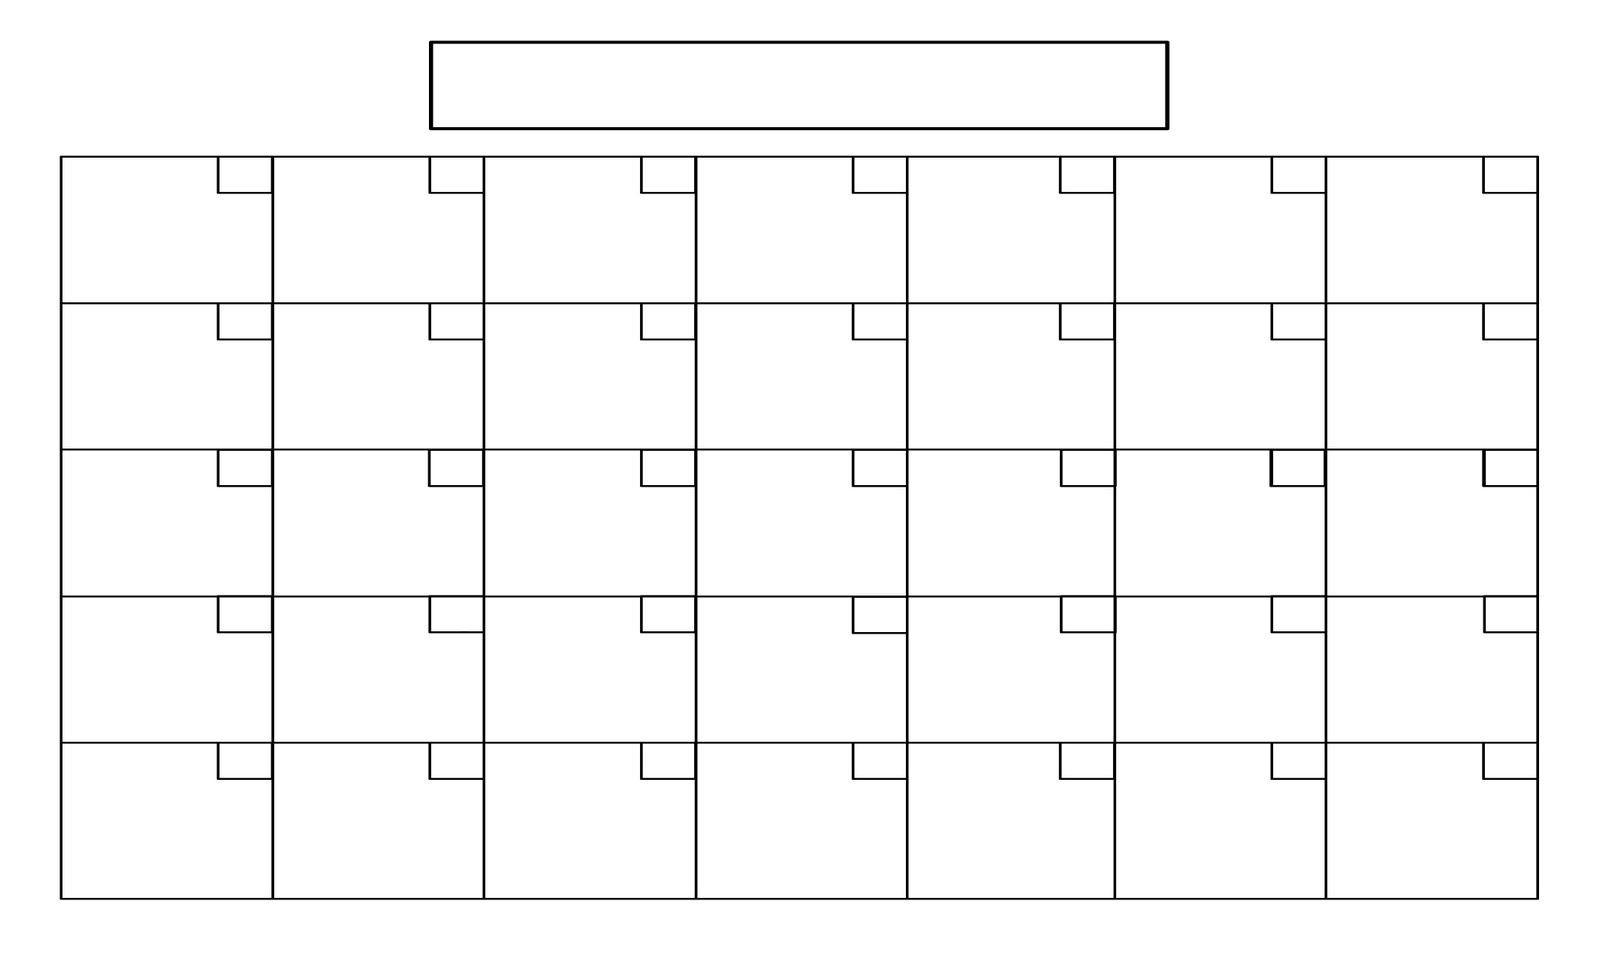 Printable+Full+Page+Blank+Calendar+Template | Calendar  Full Page Blank Calendar Printable